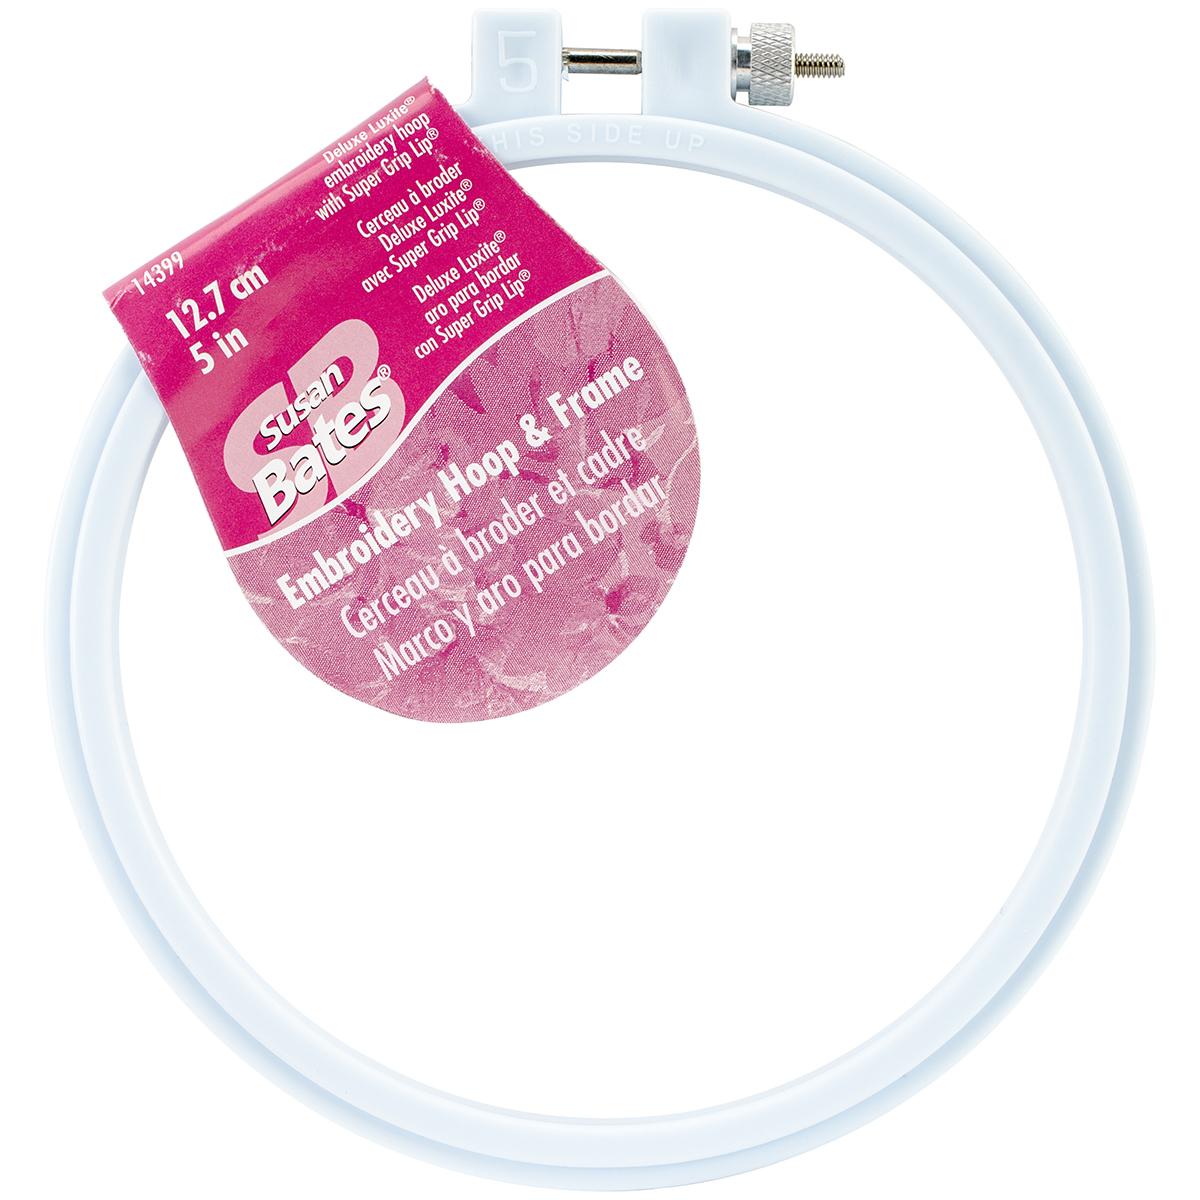 "Bates Plastic Embroidery Hoop - Light Blue-Size 5"""